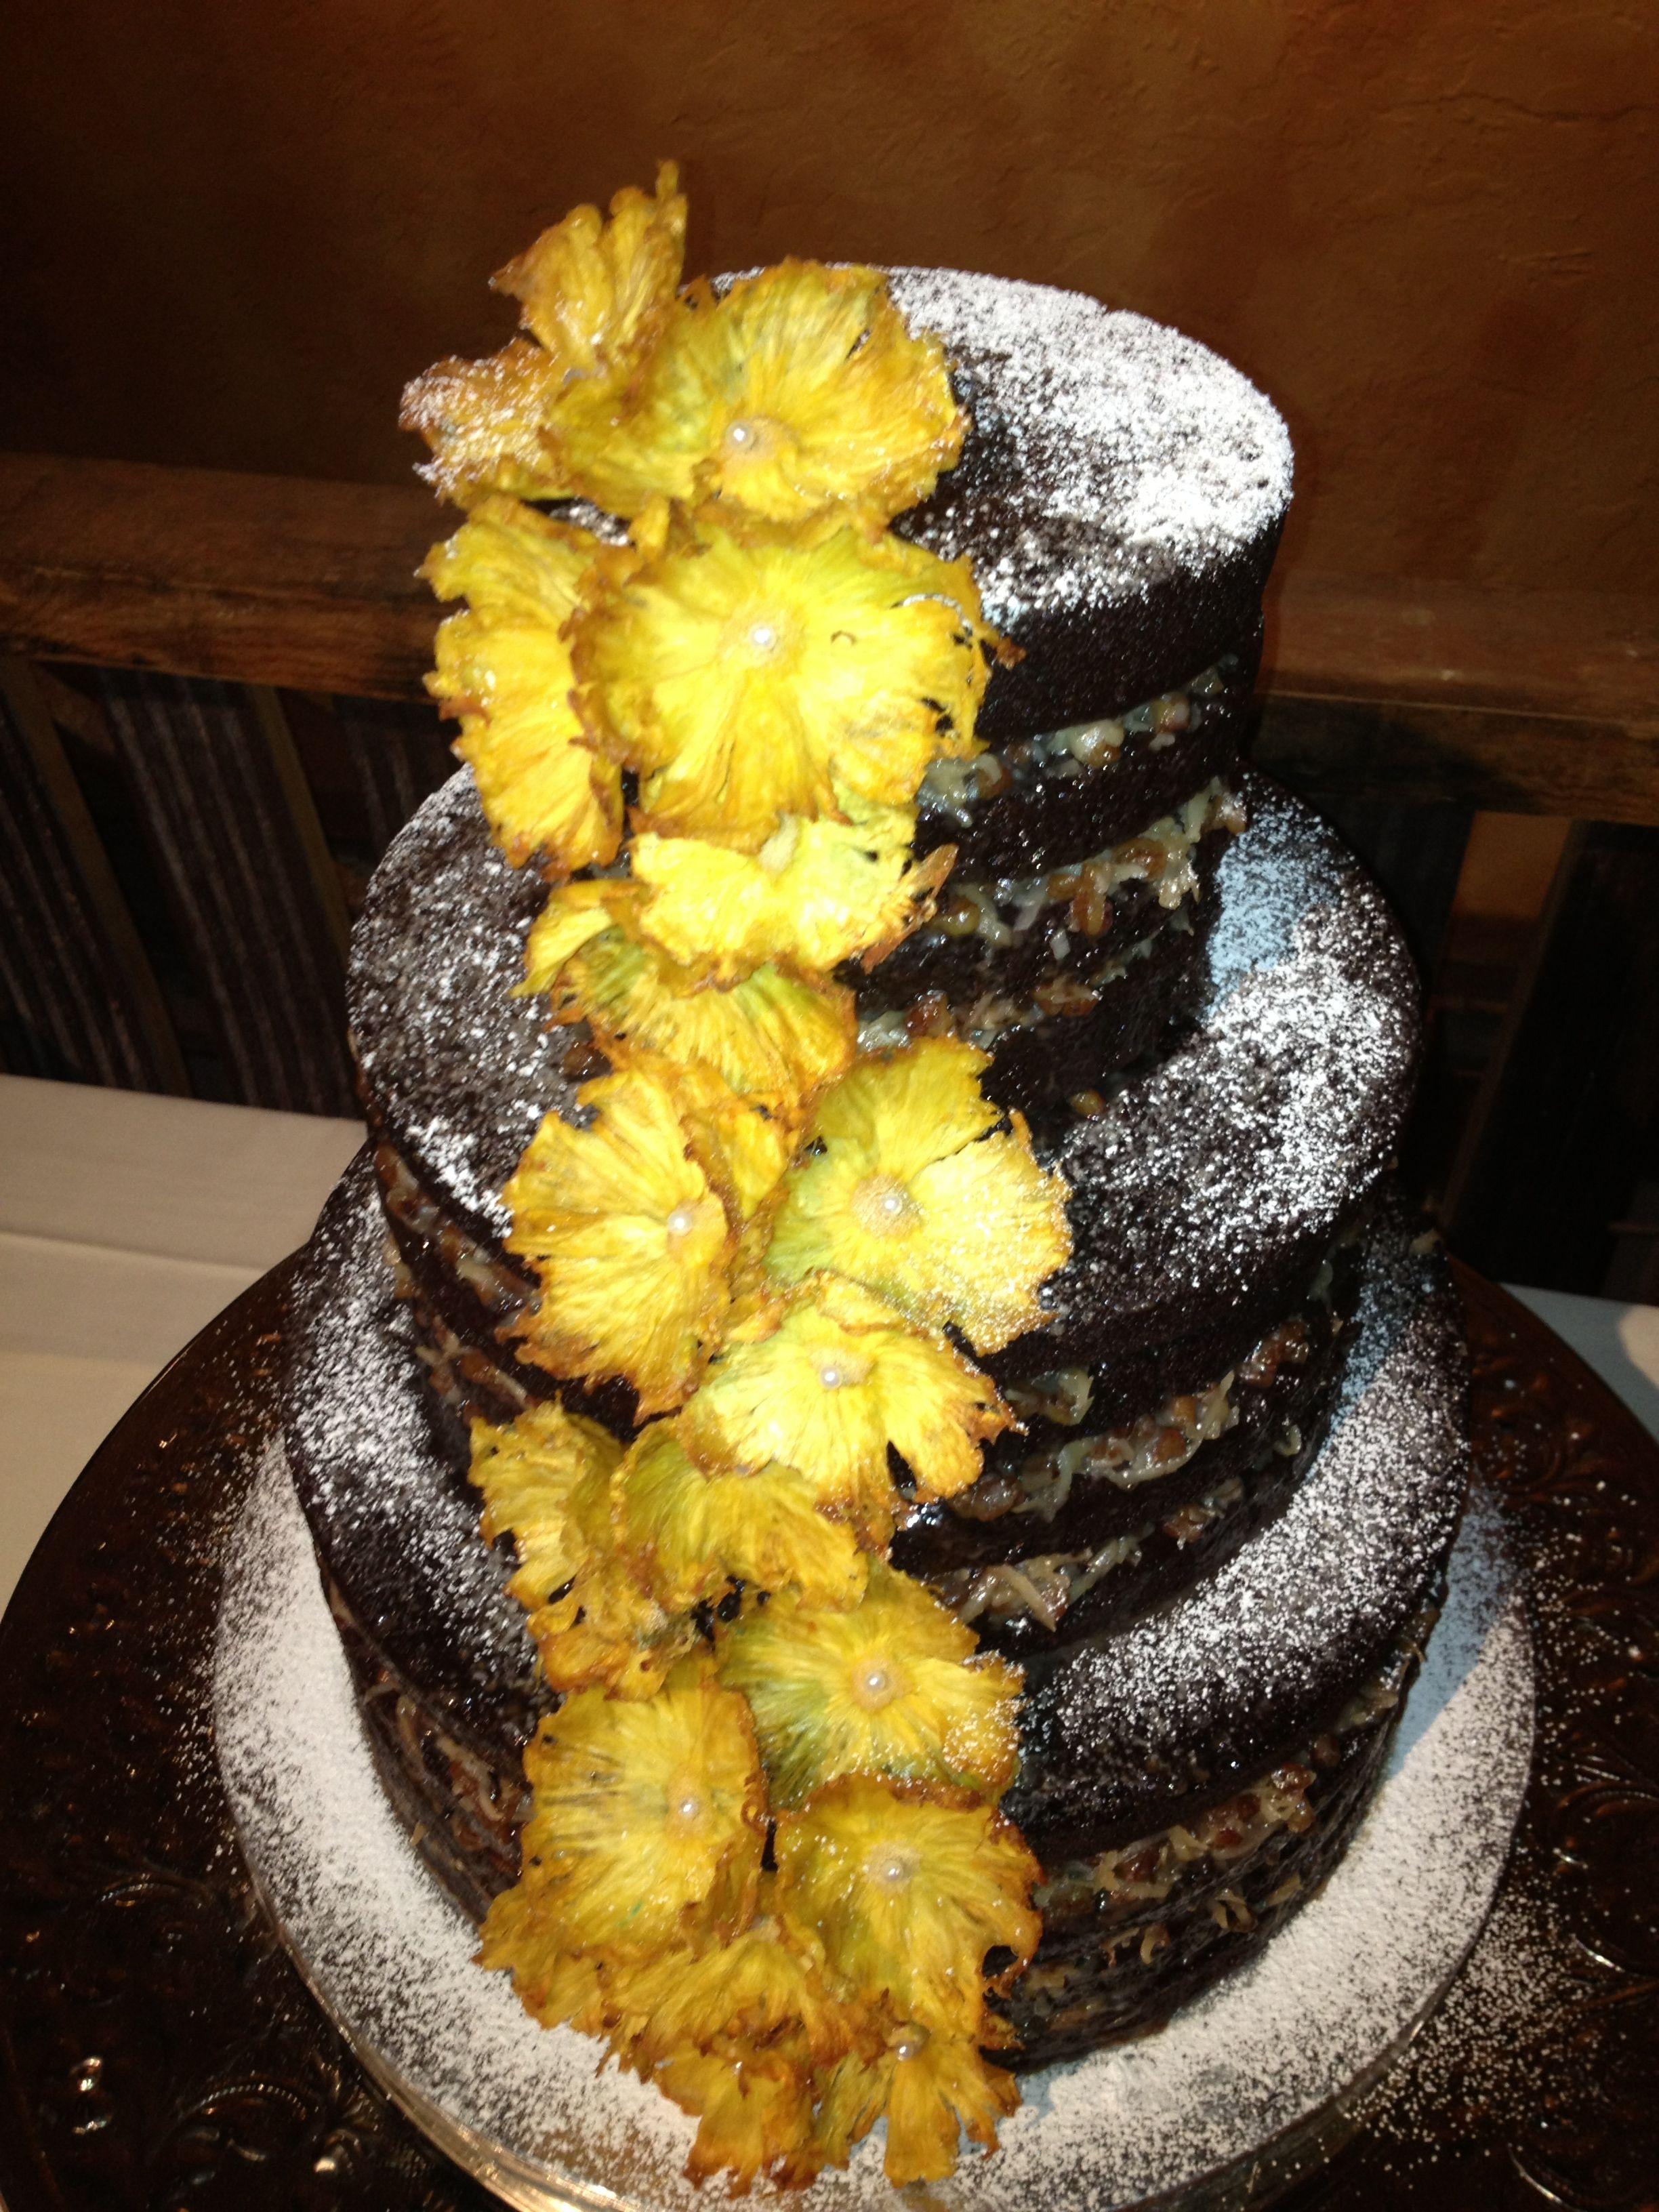 100% Vegan German Chocolate wedding cake with Pineapple flowers ...